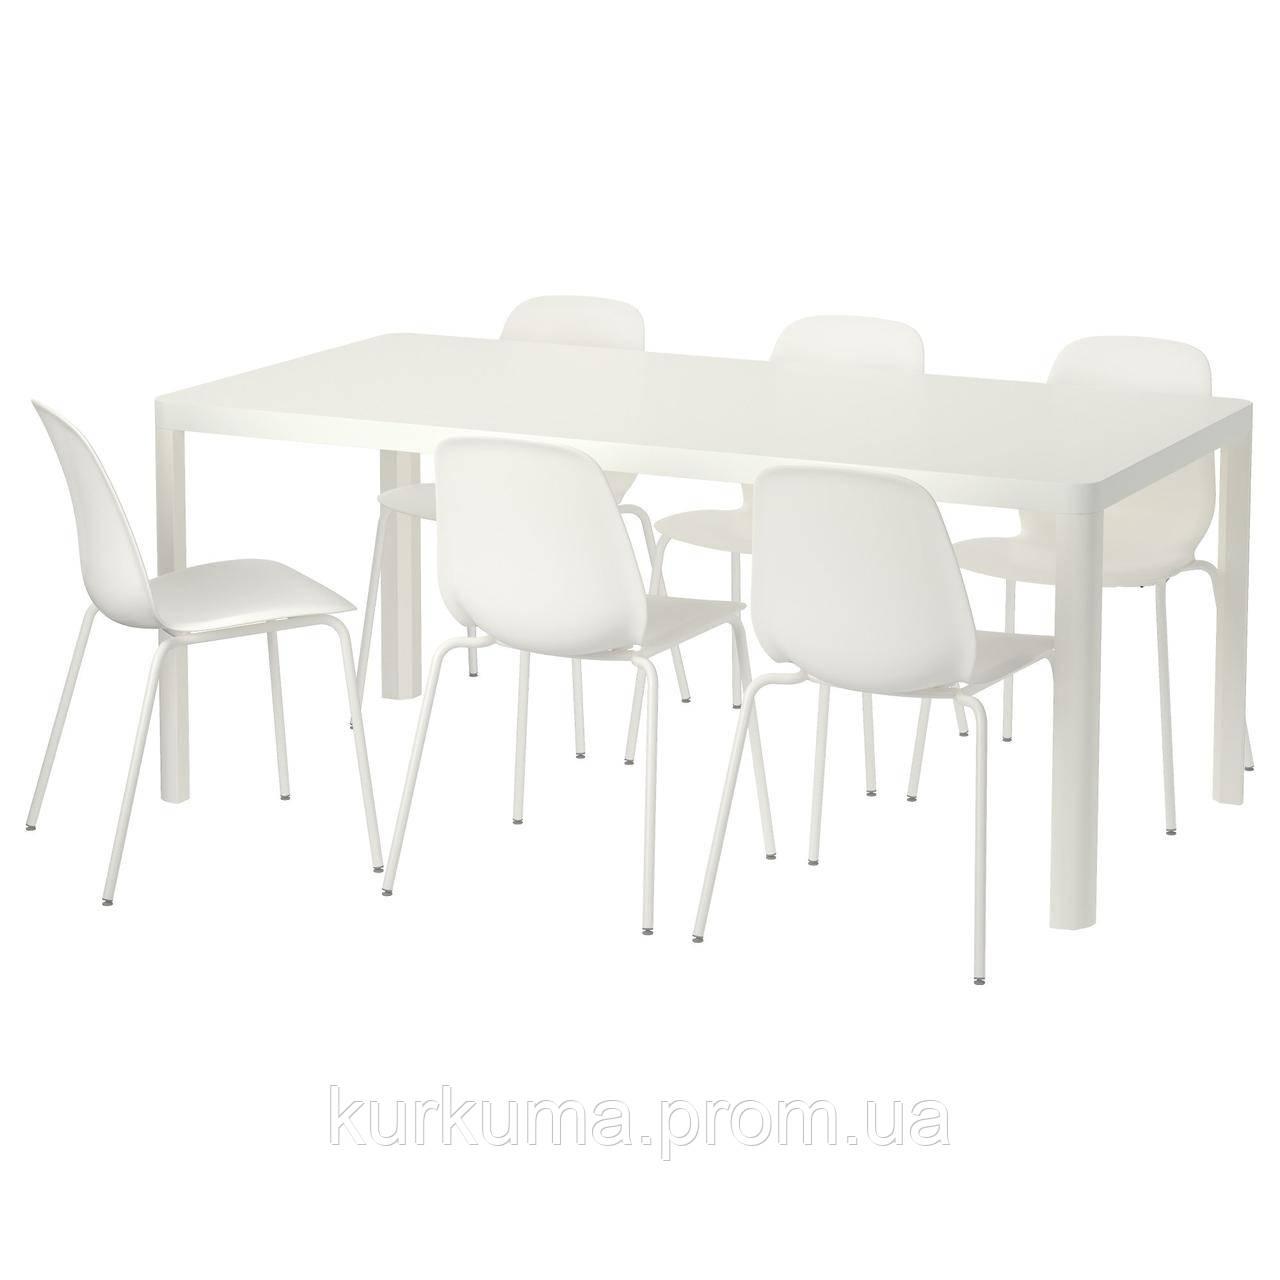 IKEA TINGBY/LEIFARNE Стол и 6 стульев, белый, белый  (392.211.90)